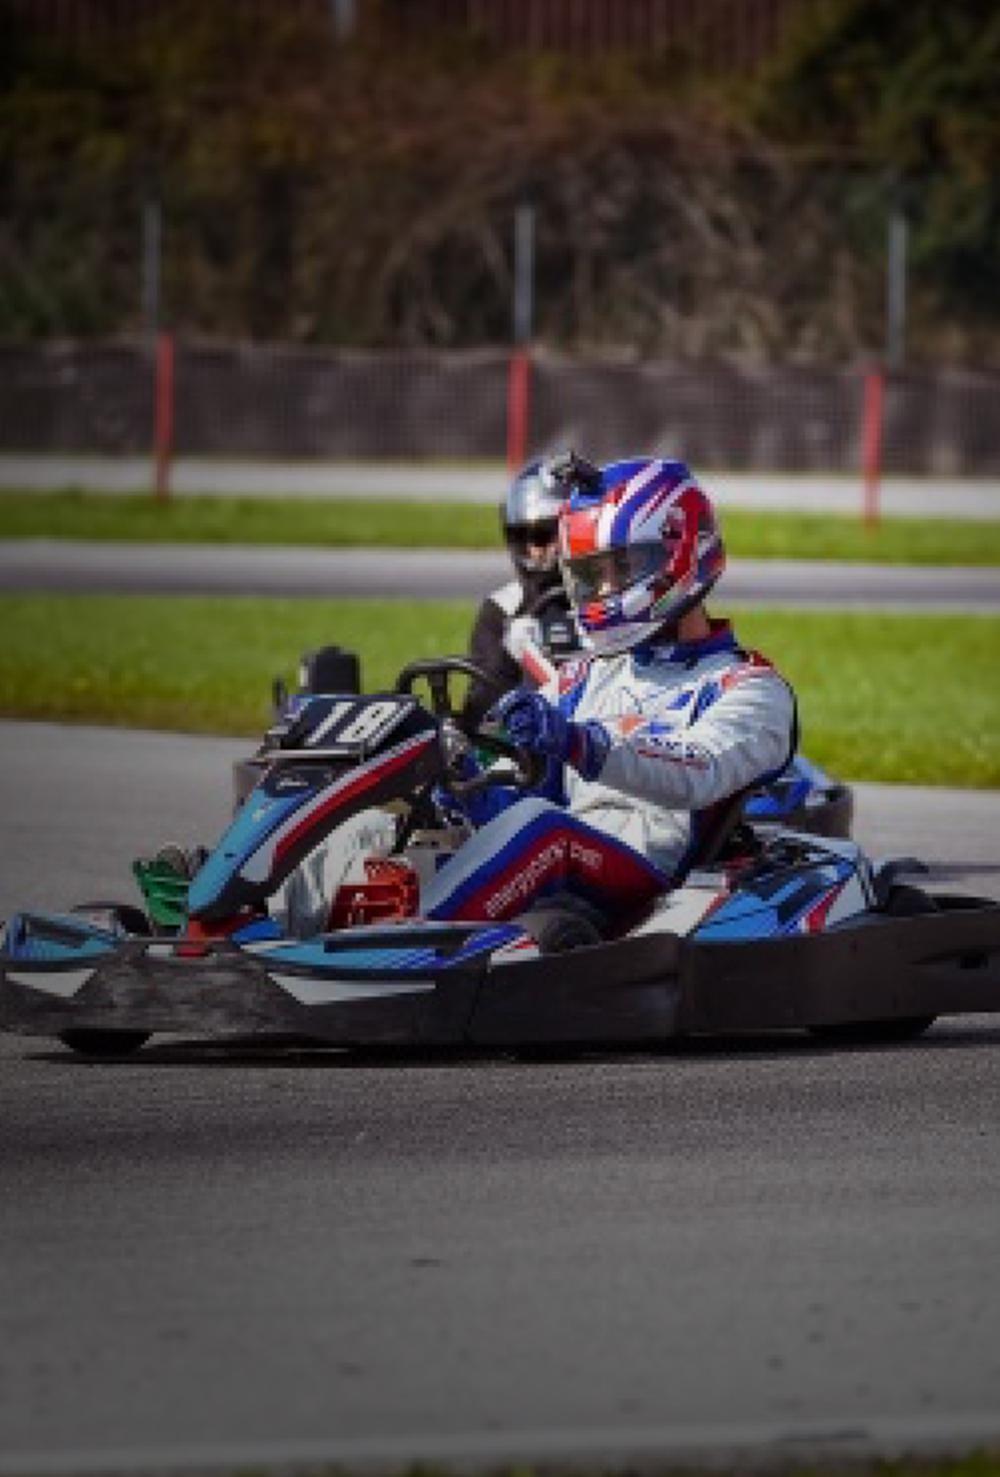 Circuito Karting : Lignano circuit